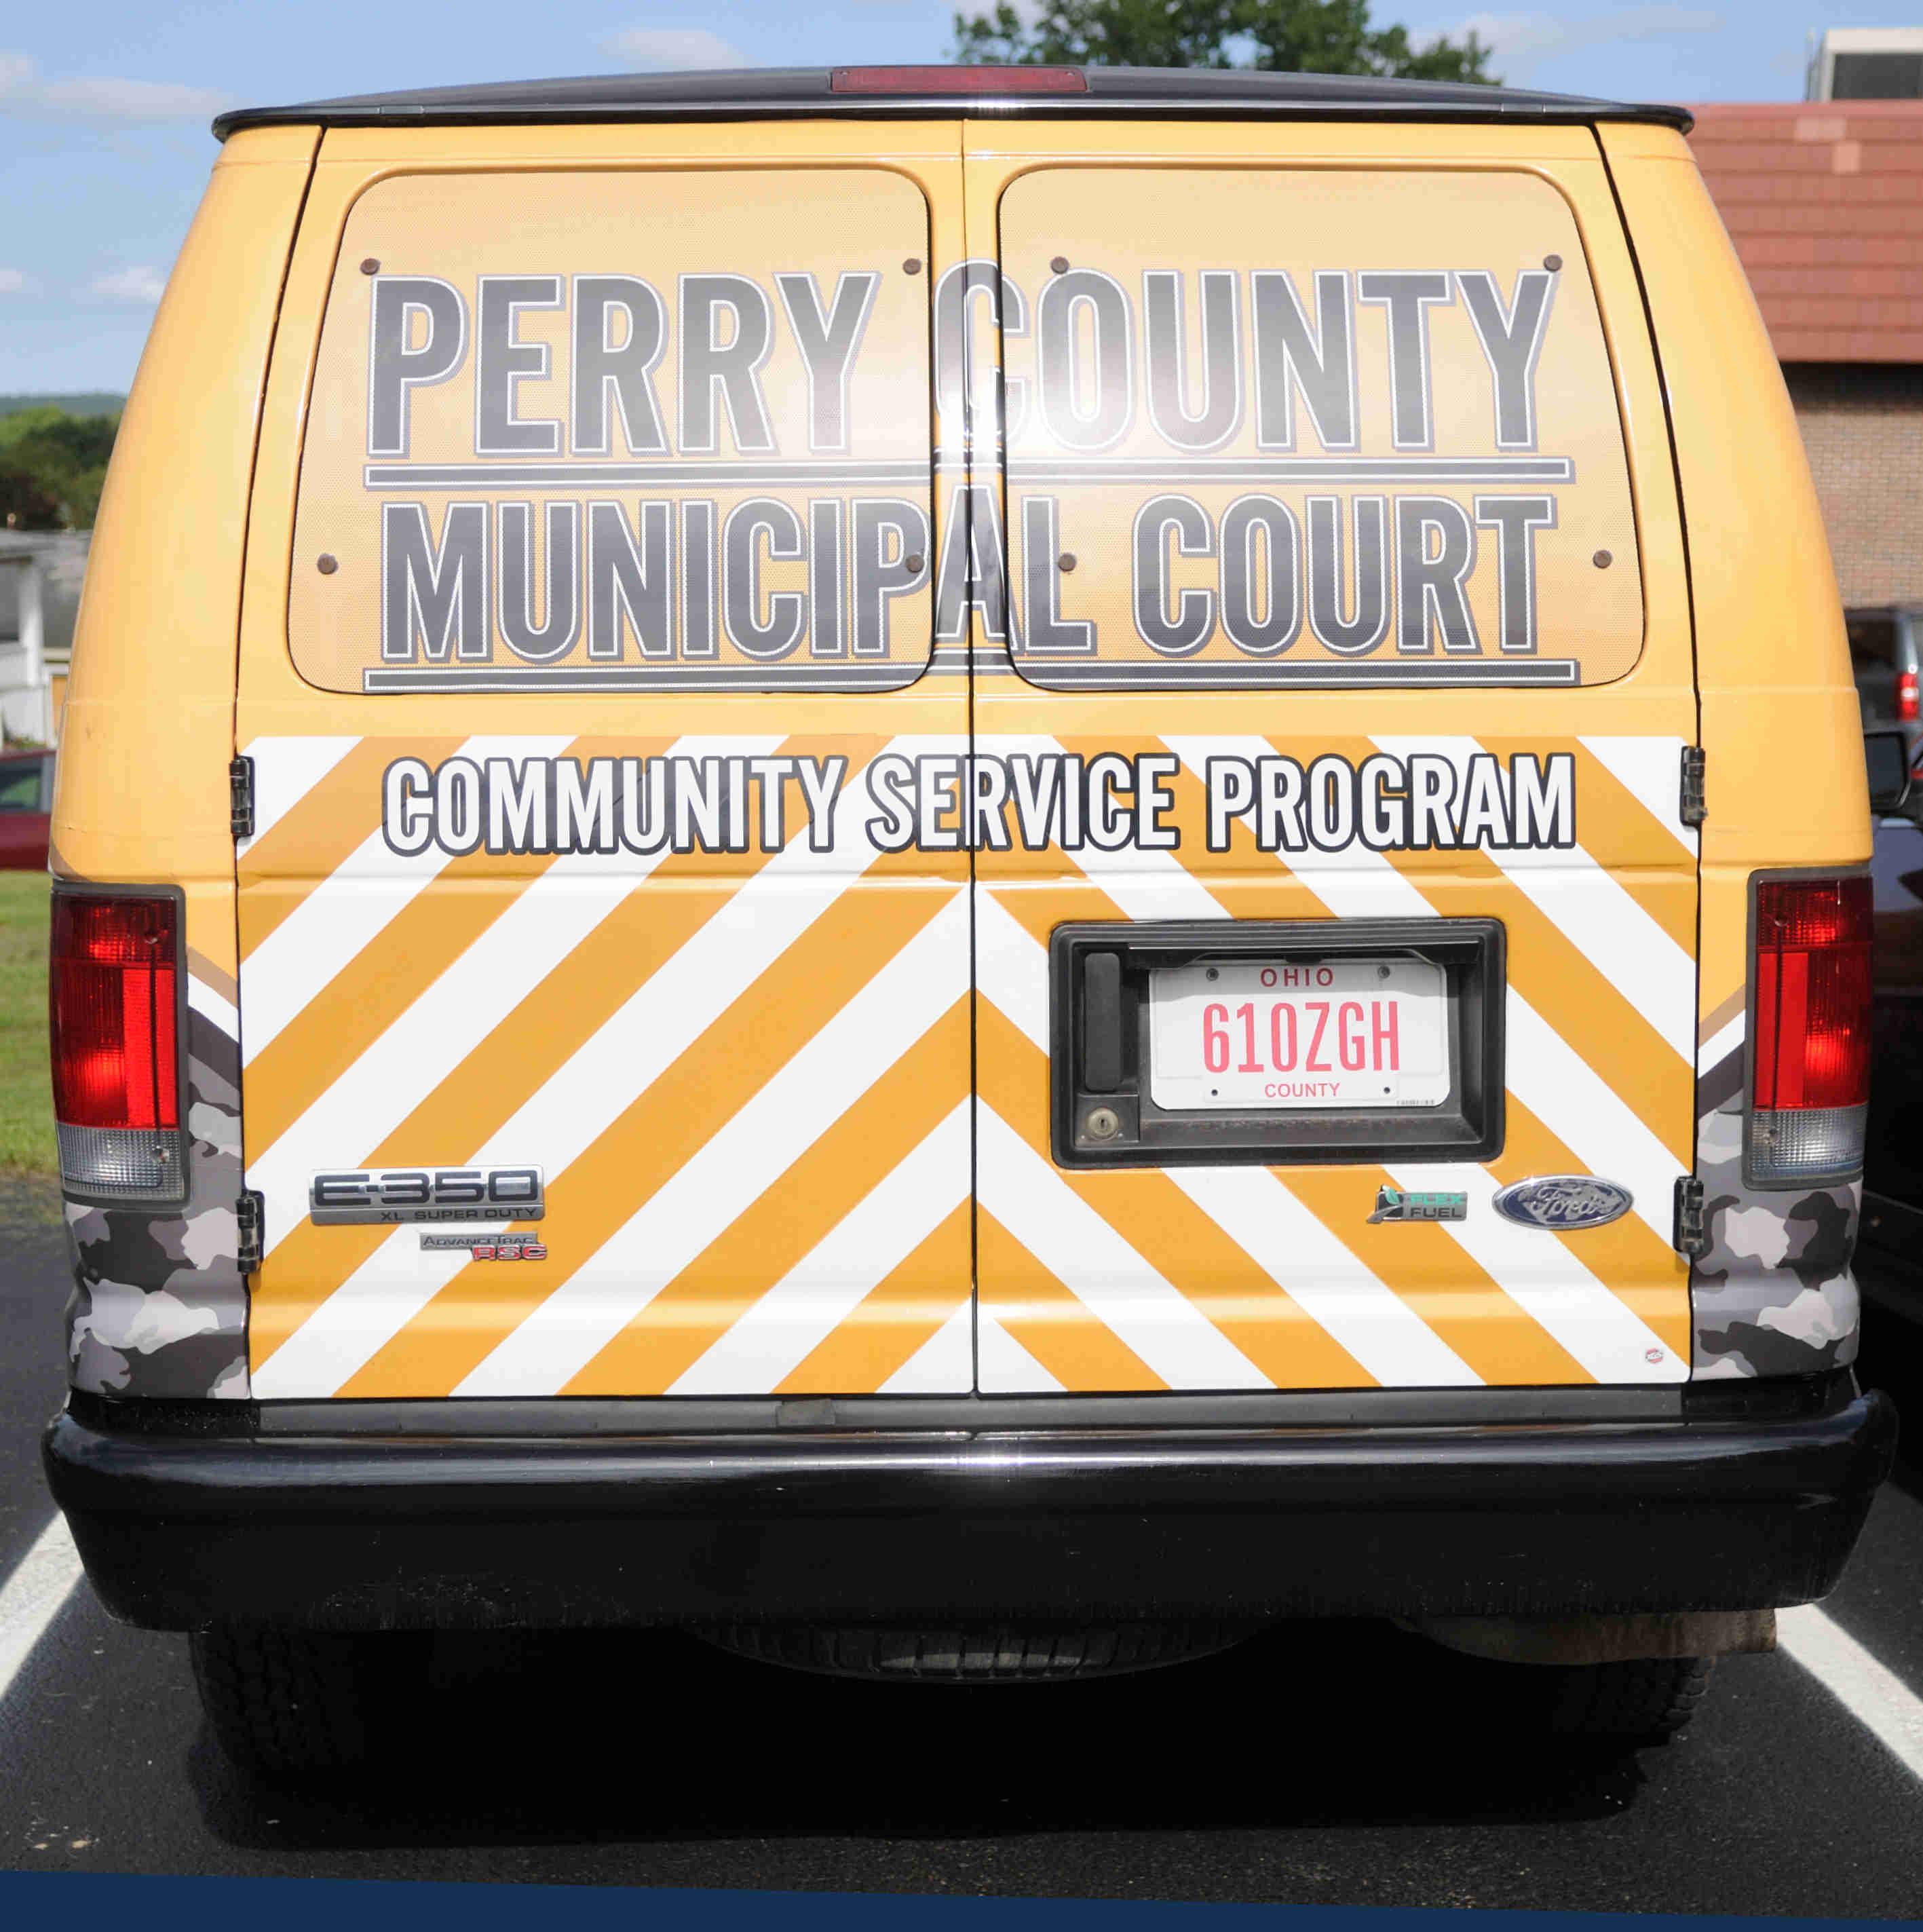 Perry County Municipal Court Community Service Program   2021 Photos